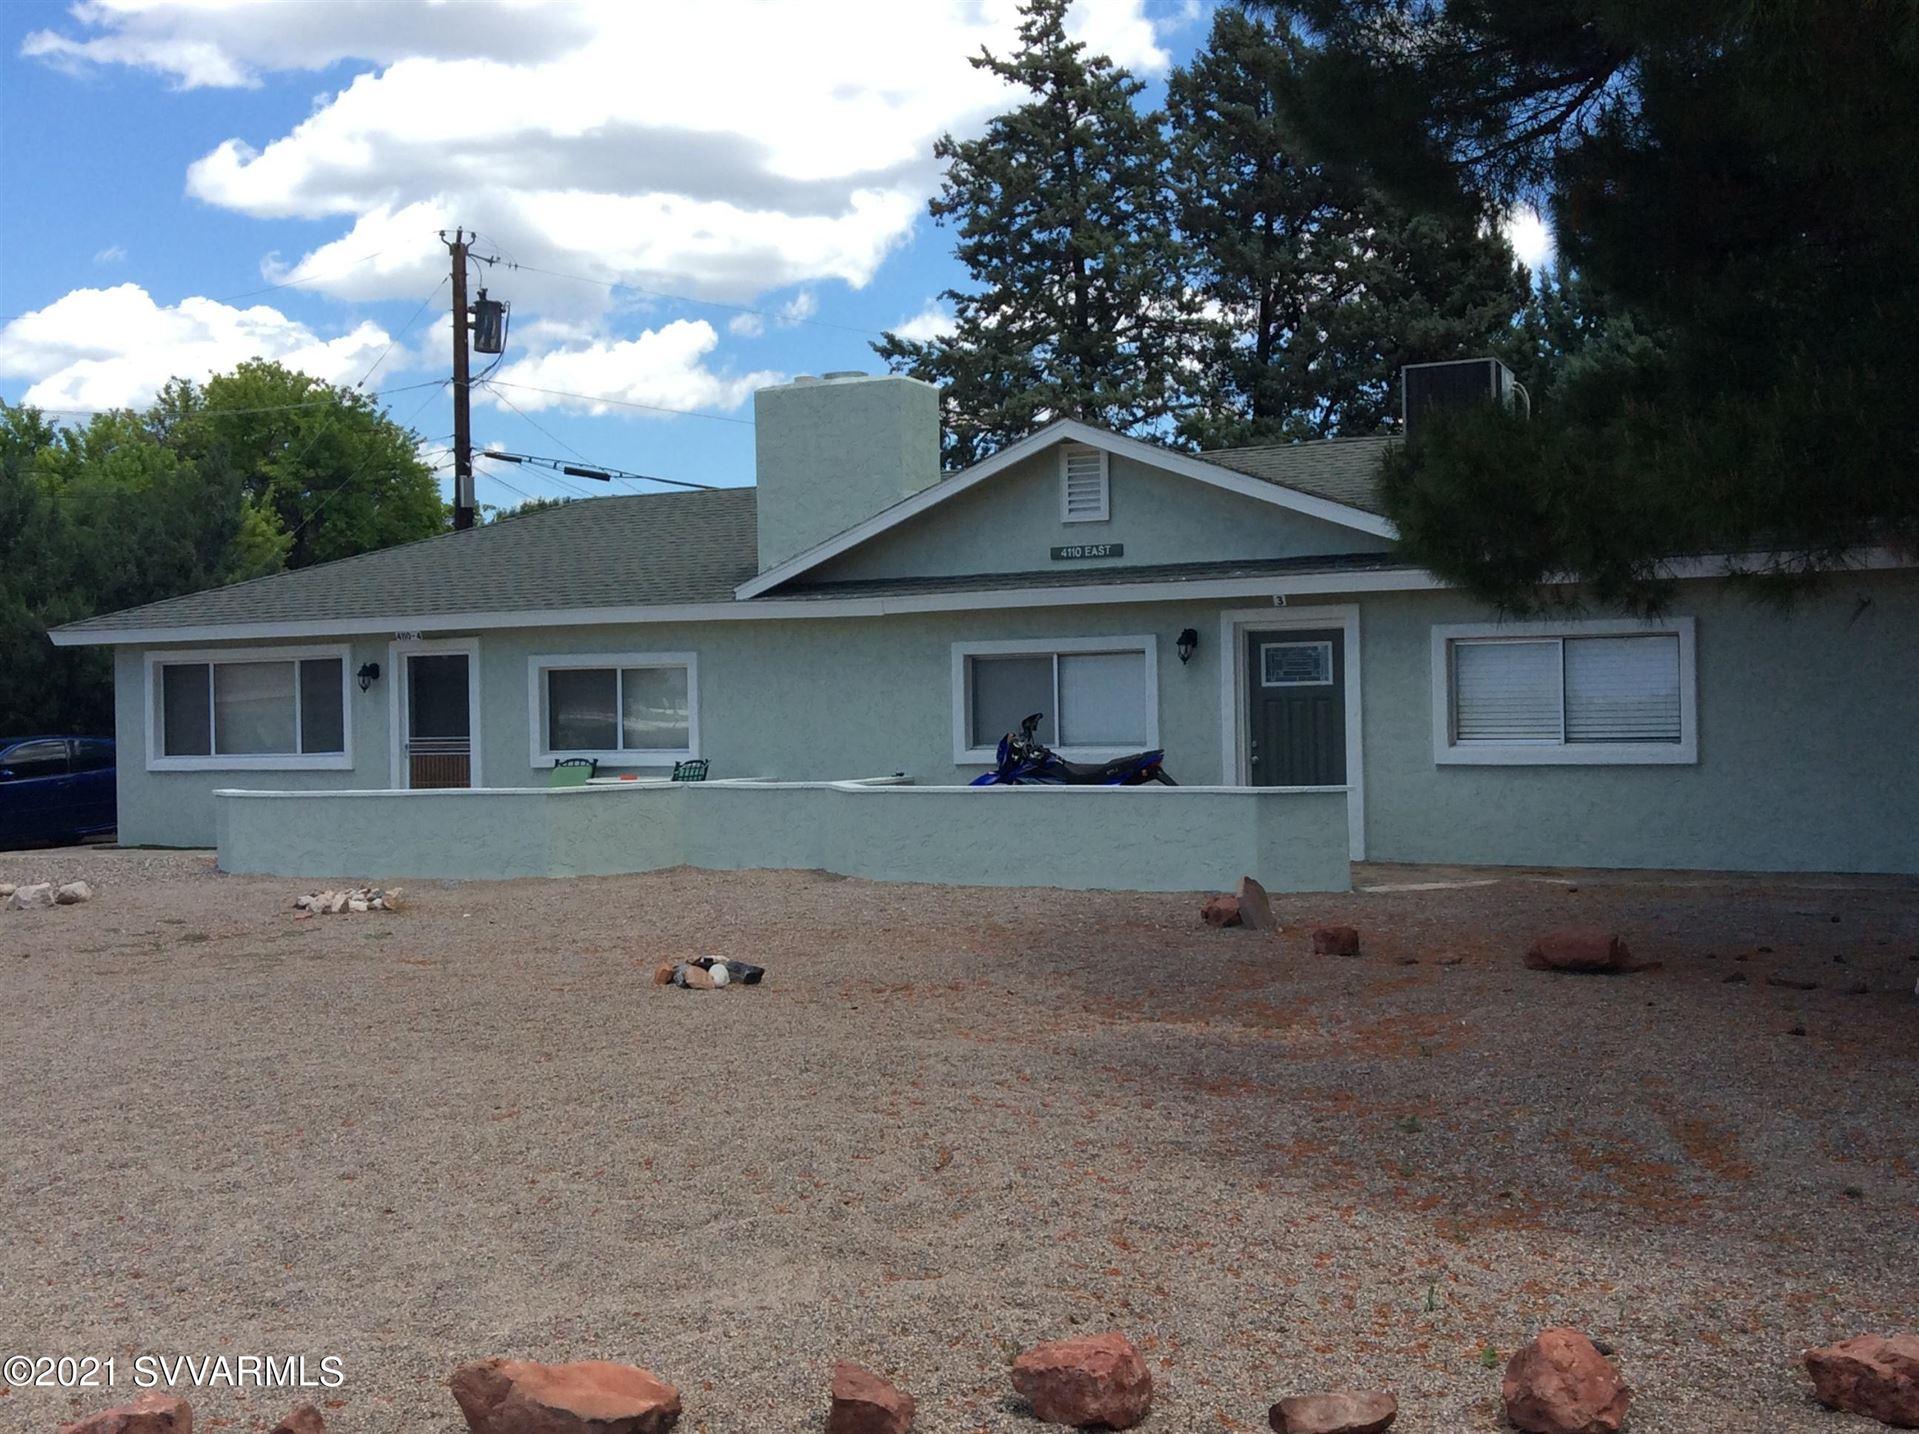 Photo of 4110 E Valley Lane, Rimrock, AZ 86335 (MLS # 526142)